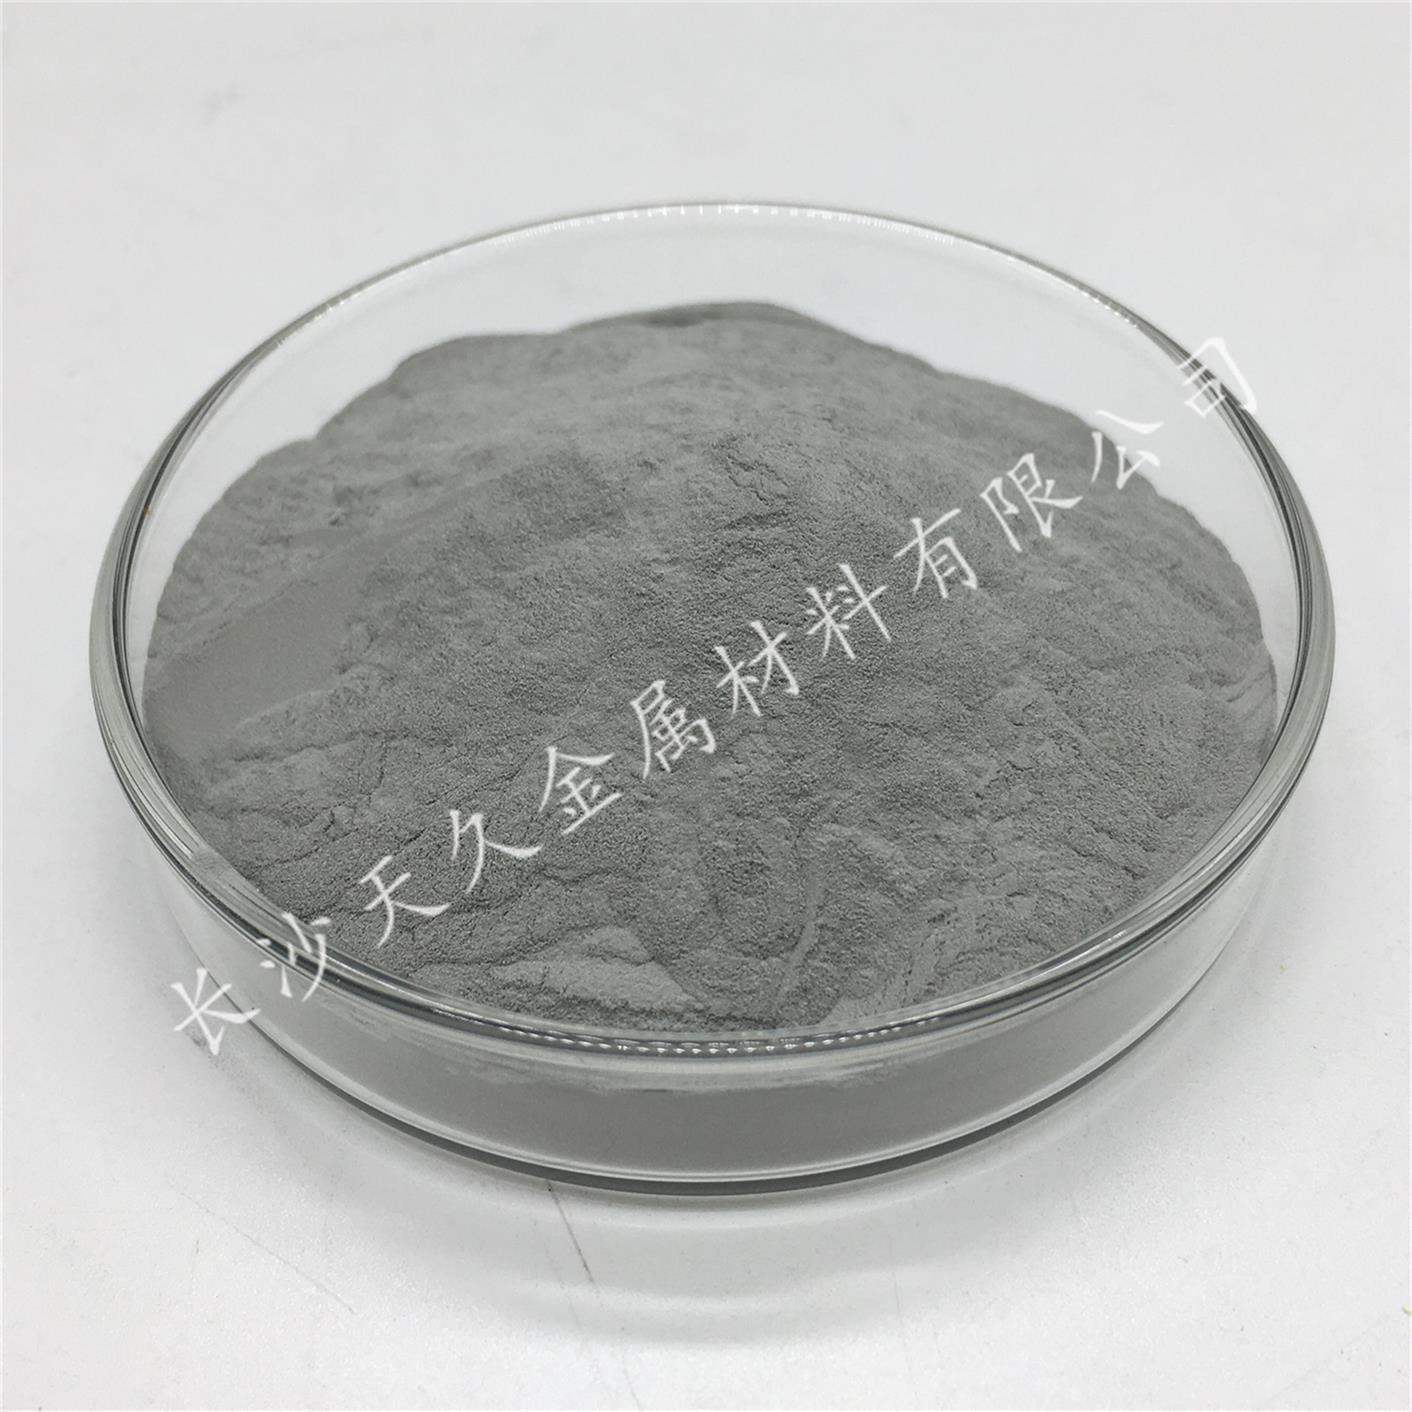 Bi100锡焊料锡基钎焊料 锡焊粉 低氧含量